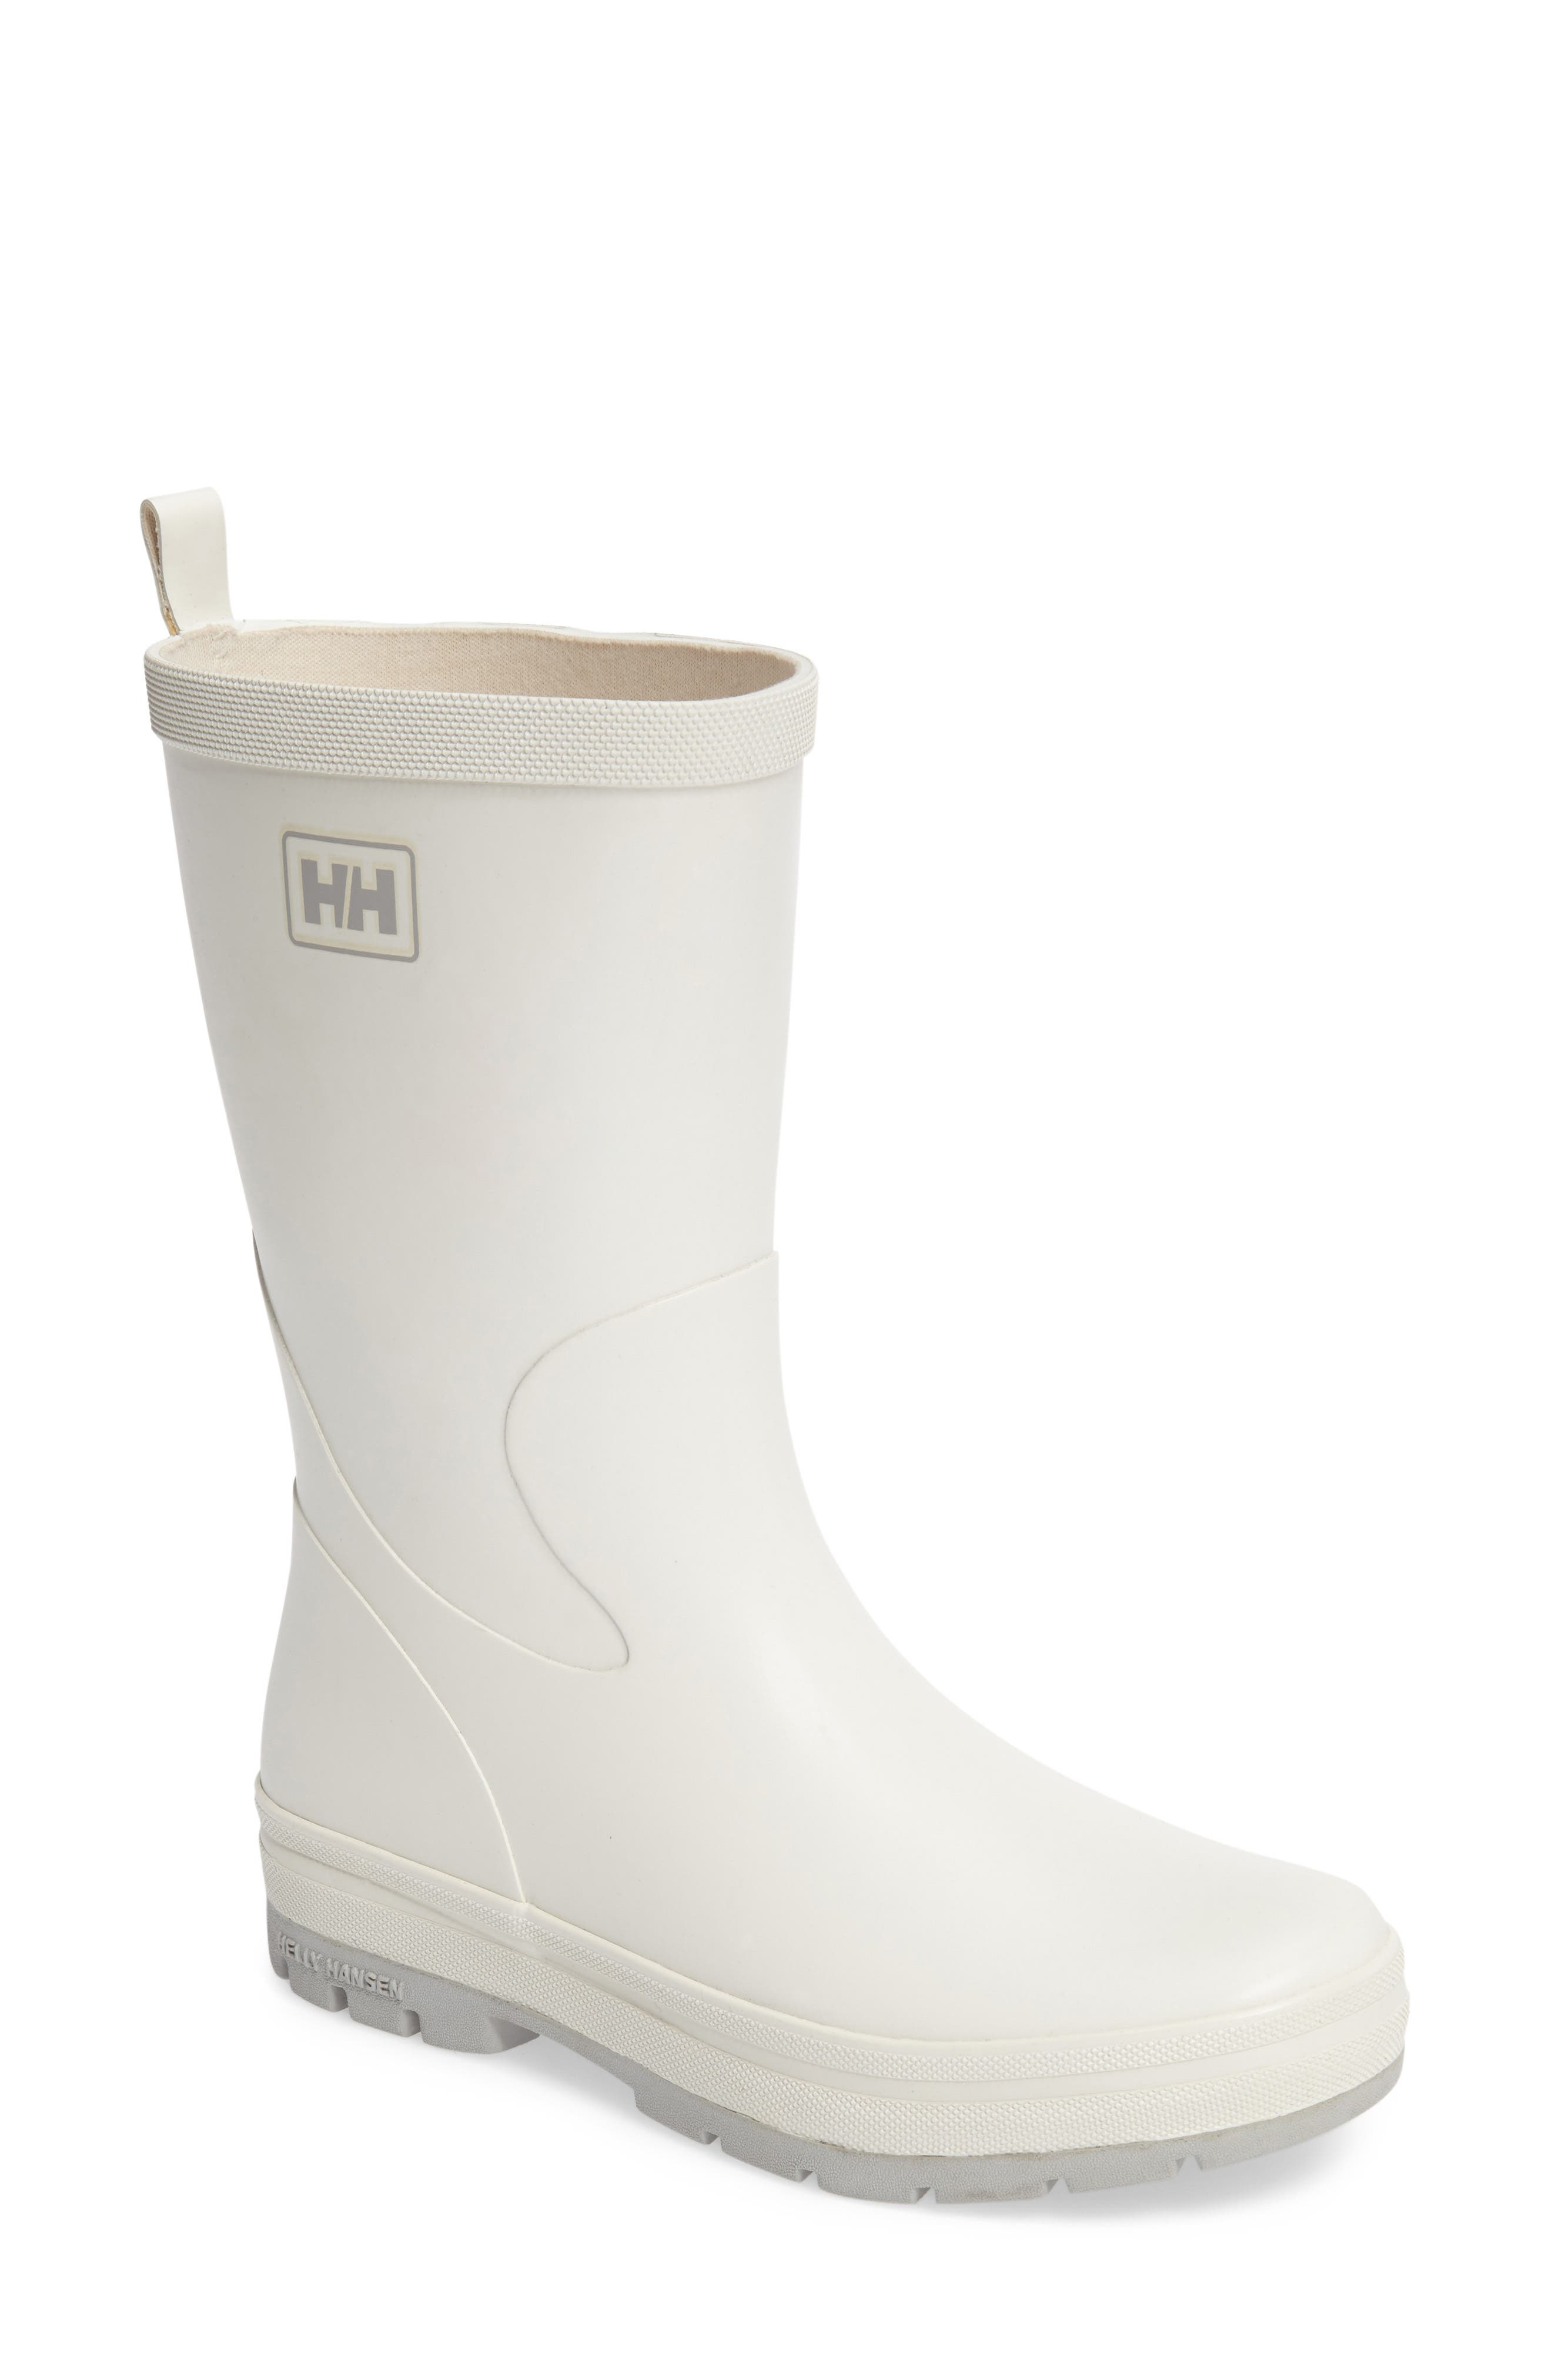 Alternate Image 1 Selected - Helly Hansen Midsund Rain Boot